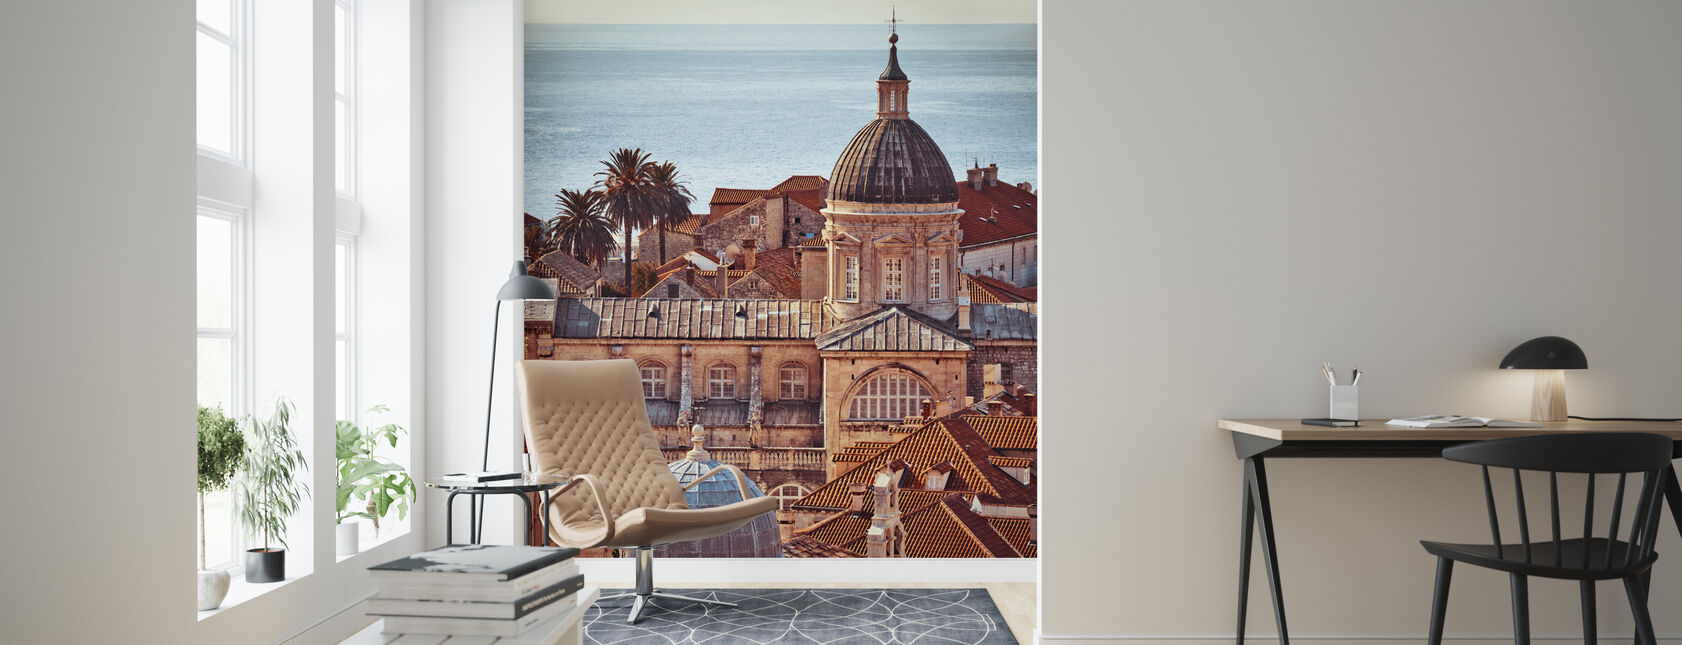 Dubrovnik - Wallpaper - Living Room